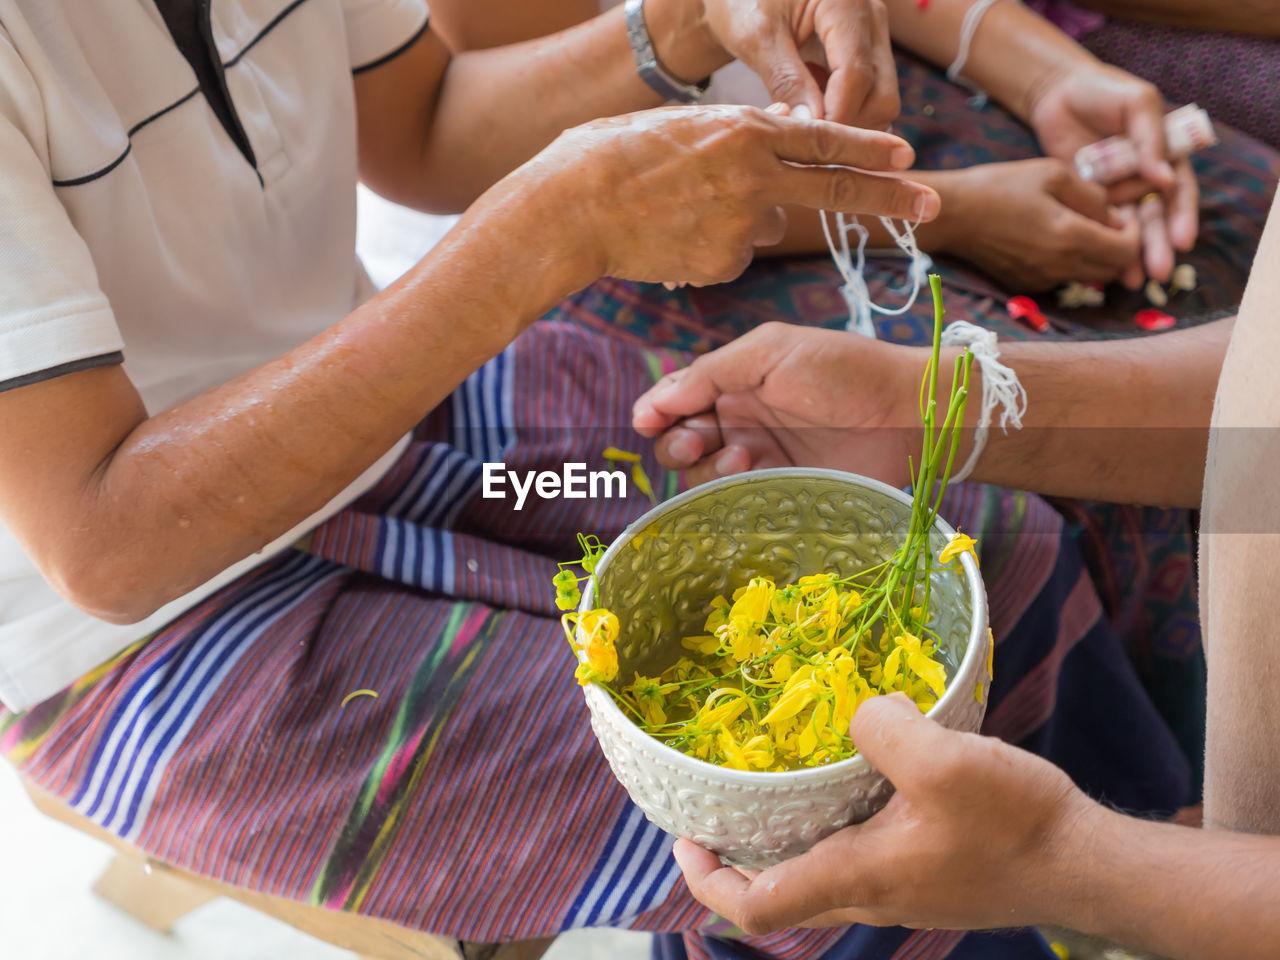 Indigenous community celebrating thread ceremony